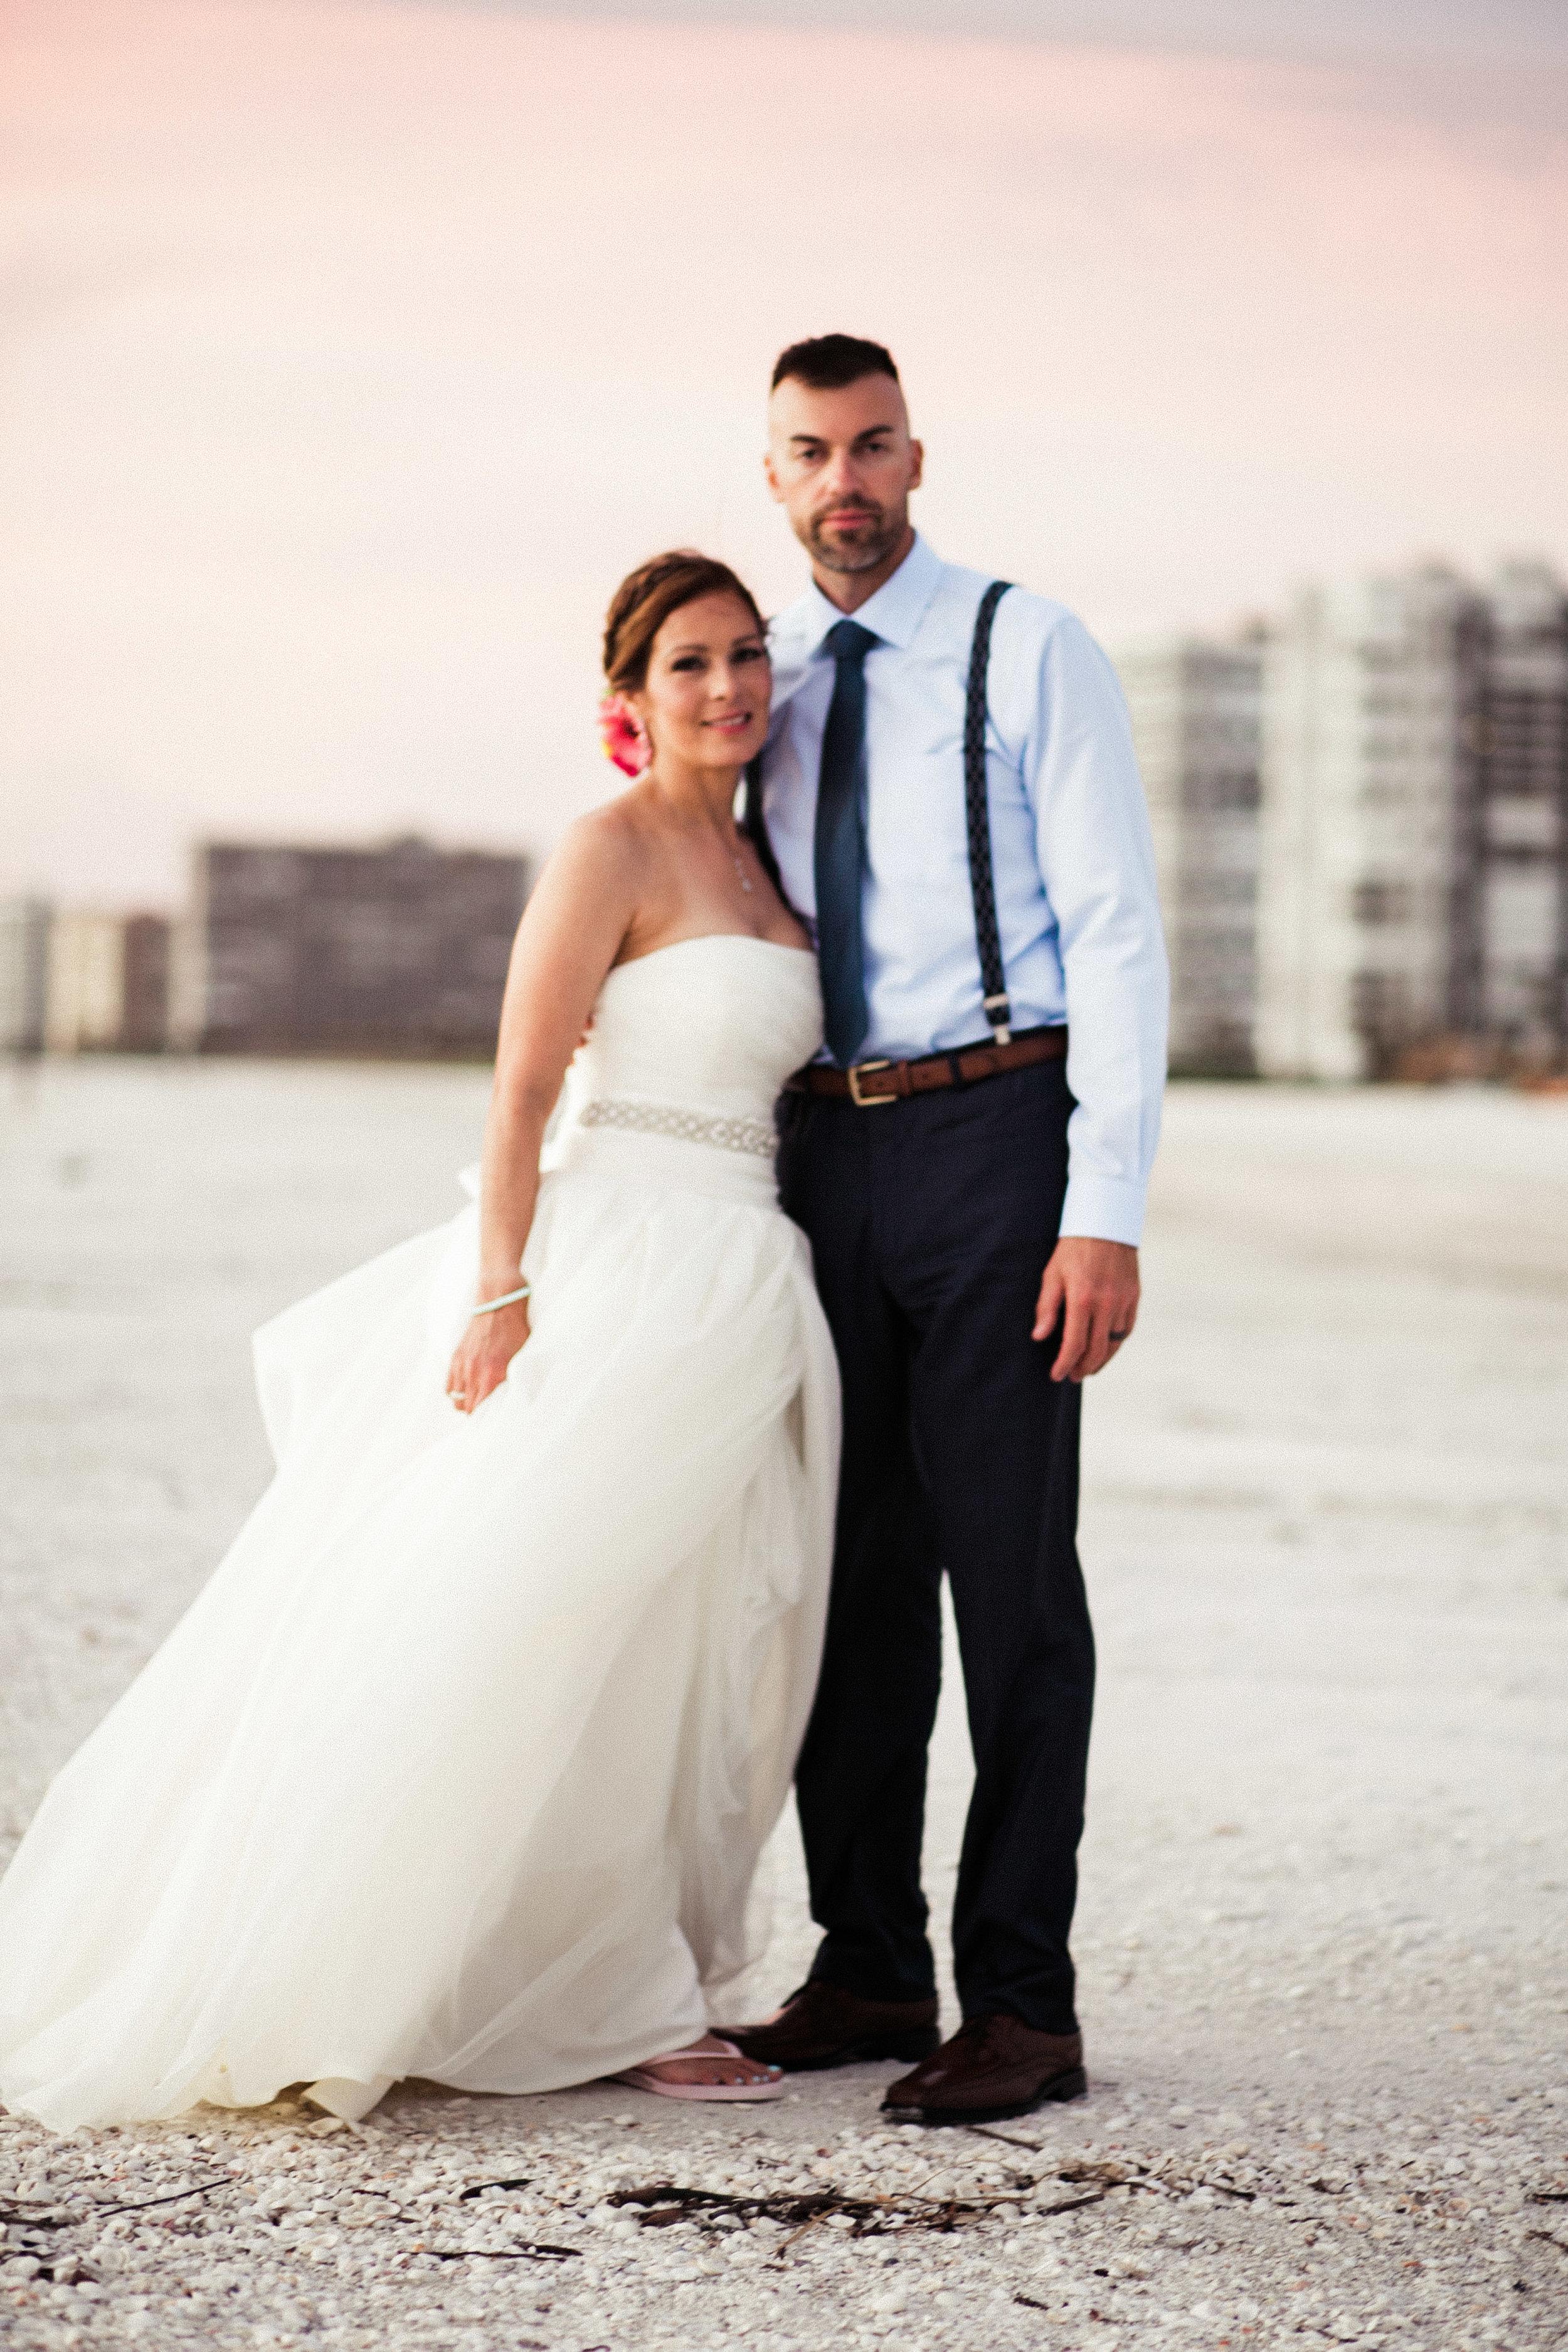 JW Marriott, Marco Island Wedding